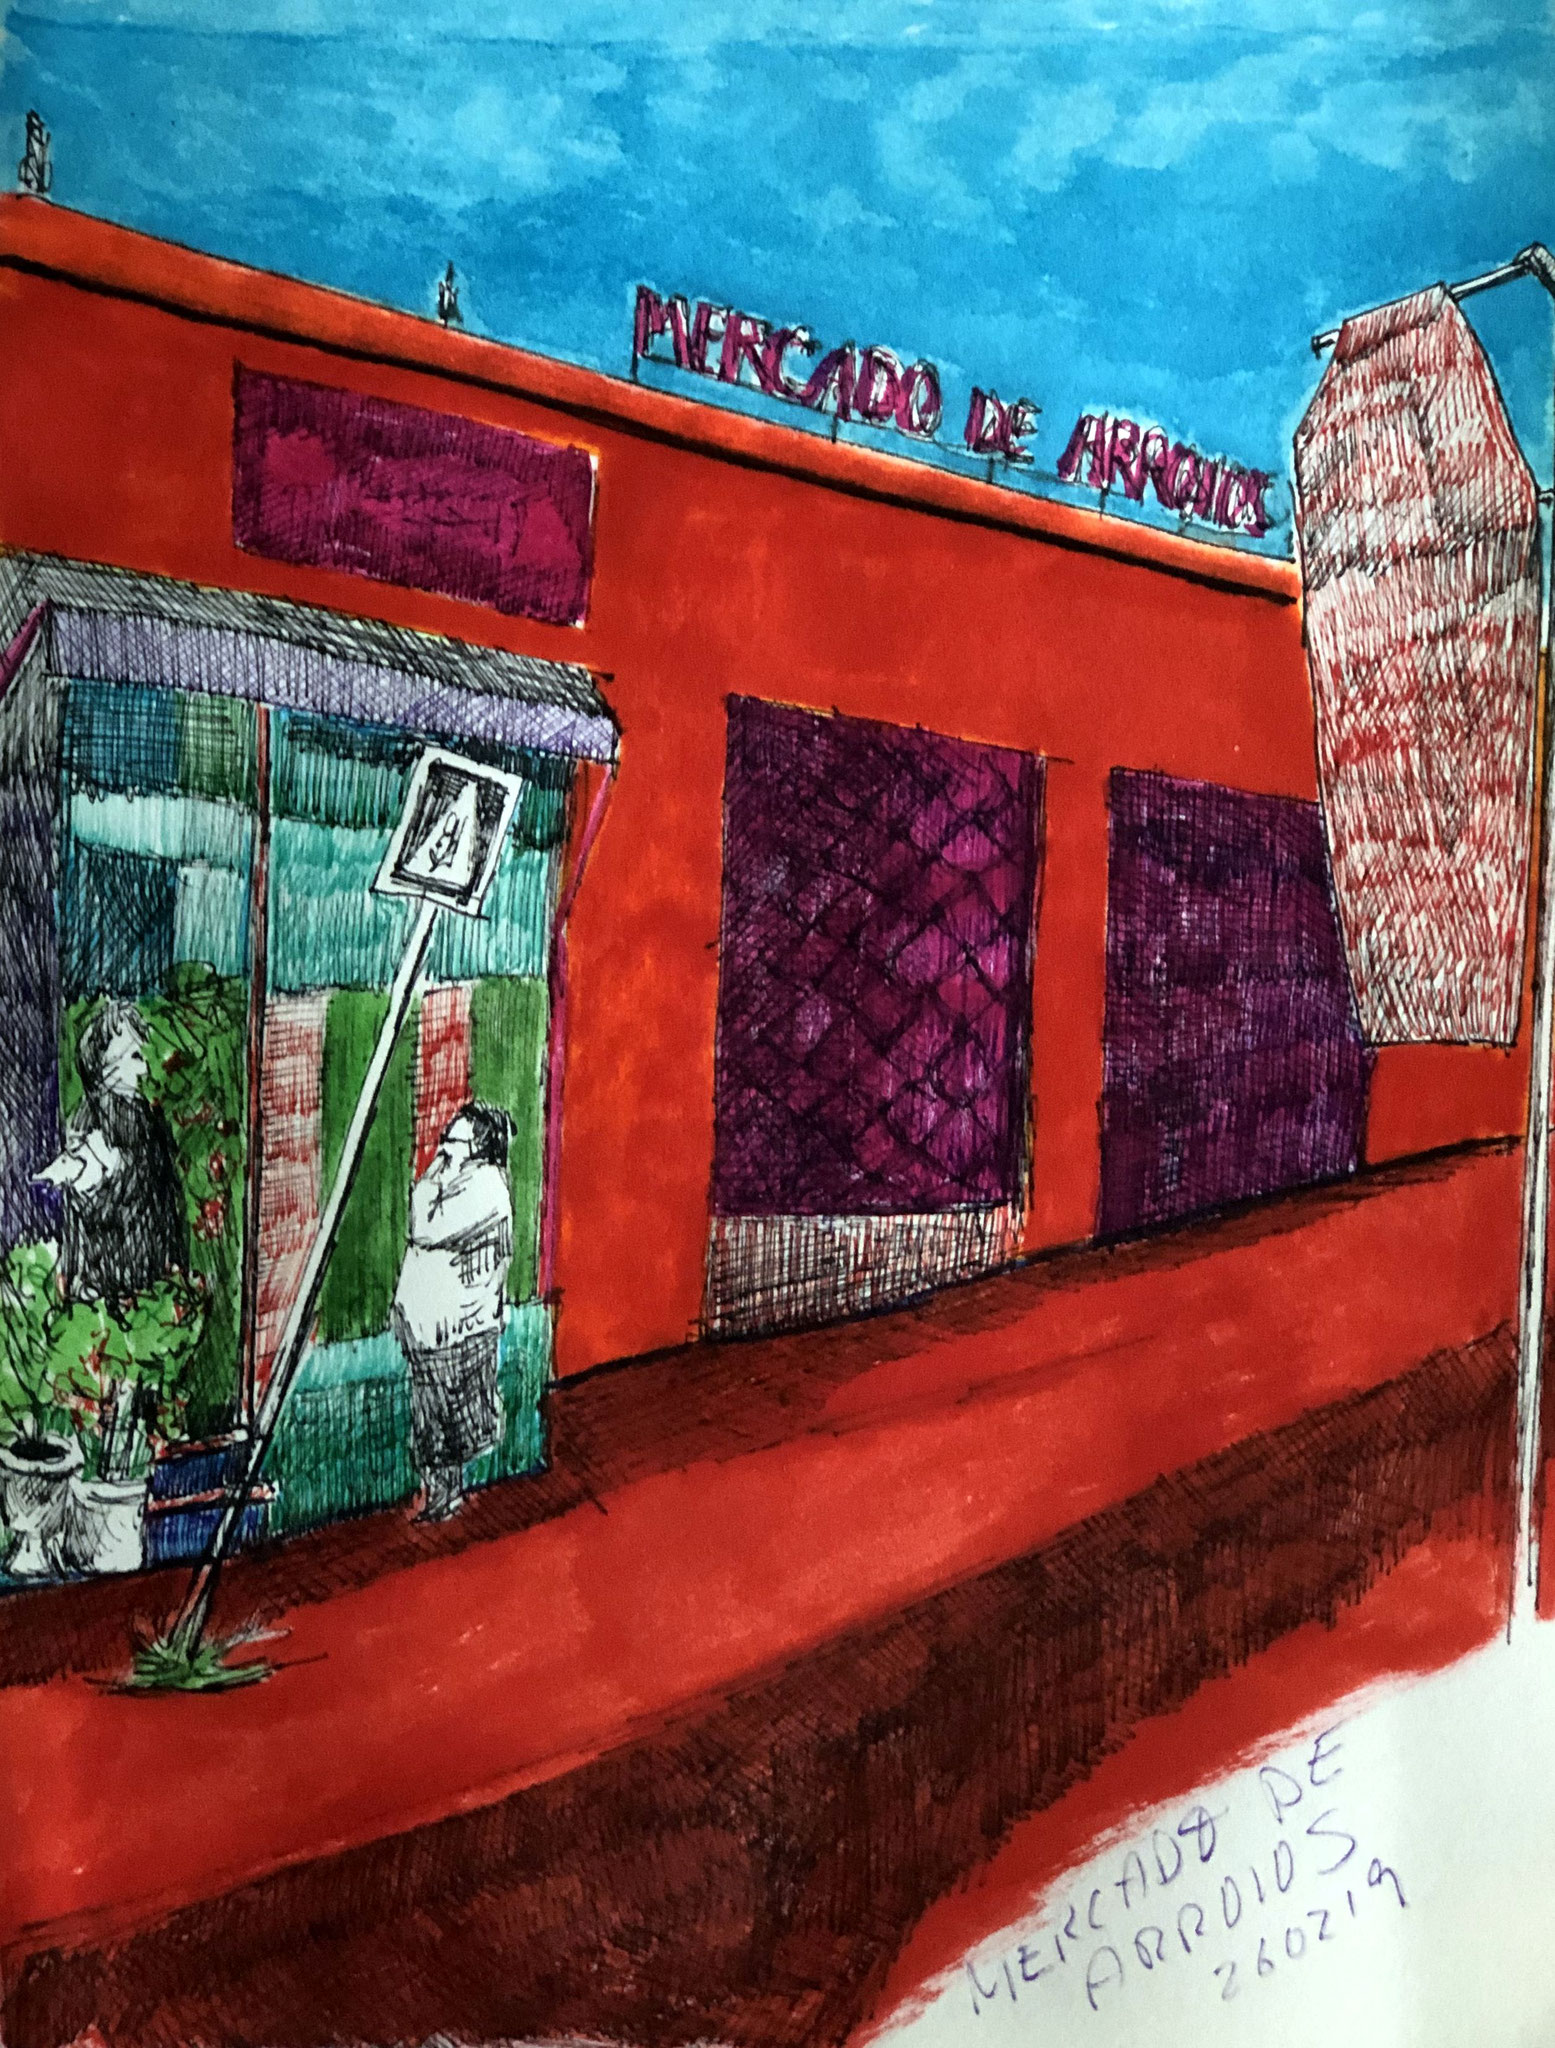 aus meinem Skizzenbuch: LISBOA, MERCADO DE ARROIOS     Mischtechnik auf Papier - 28 x 20cm